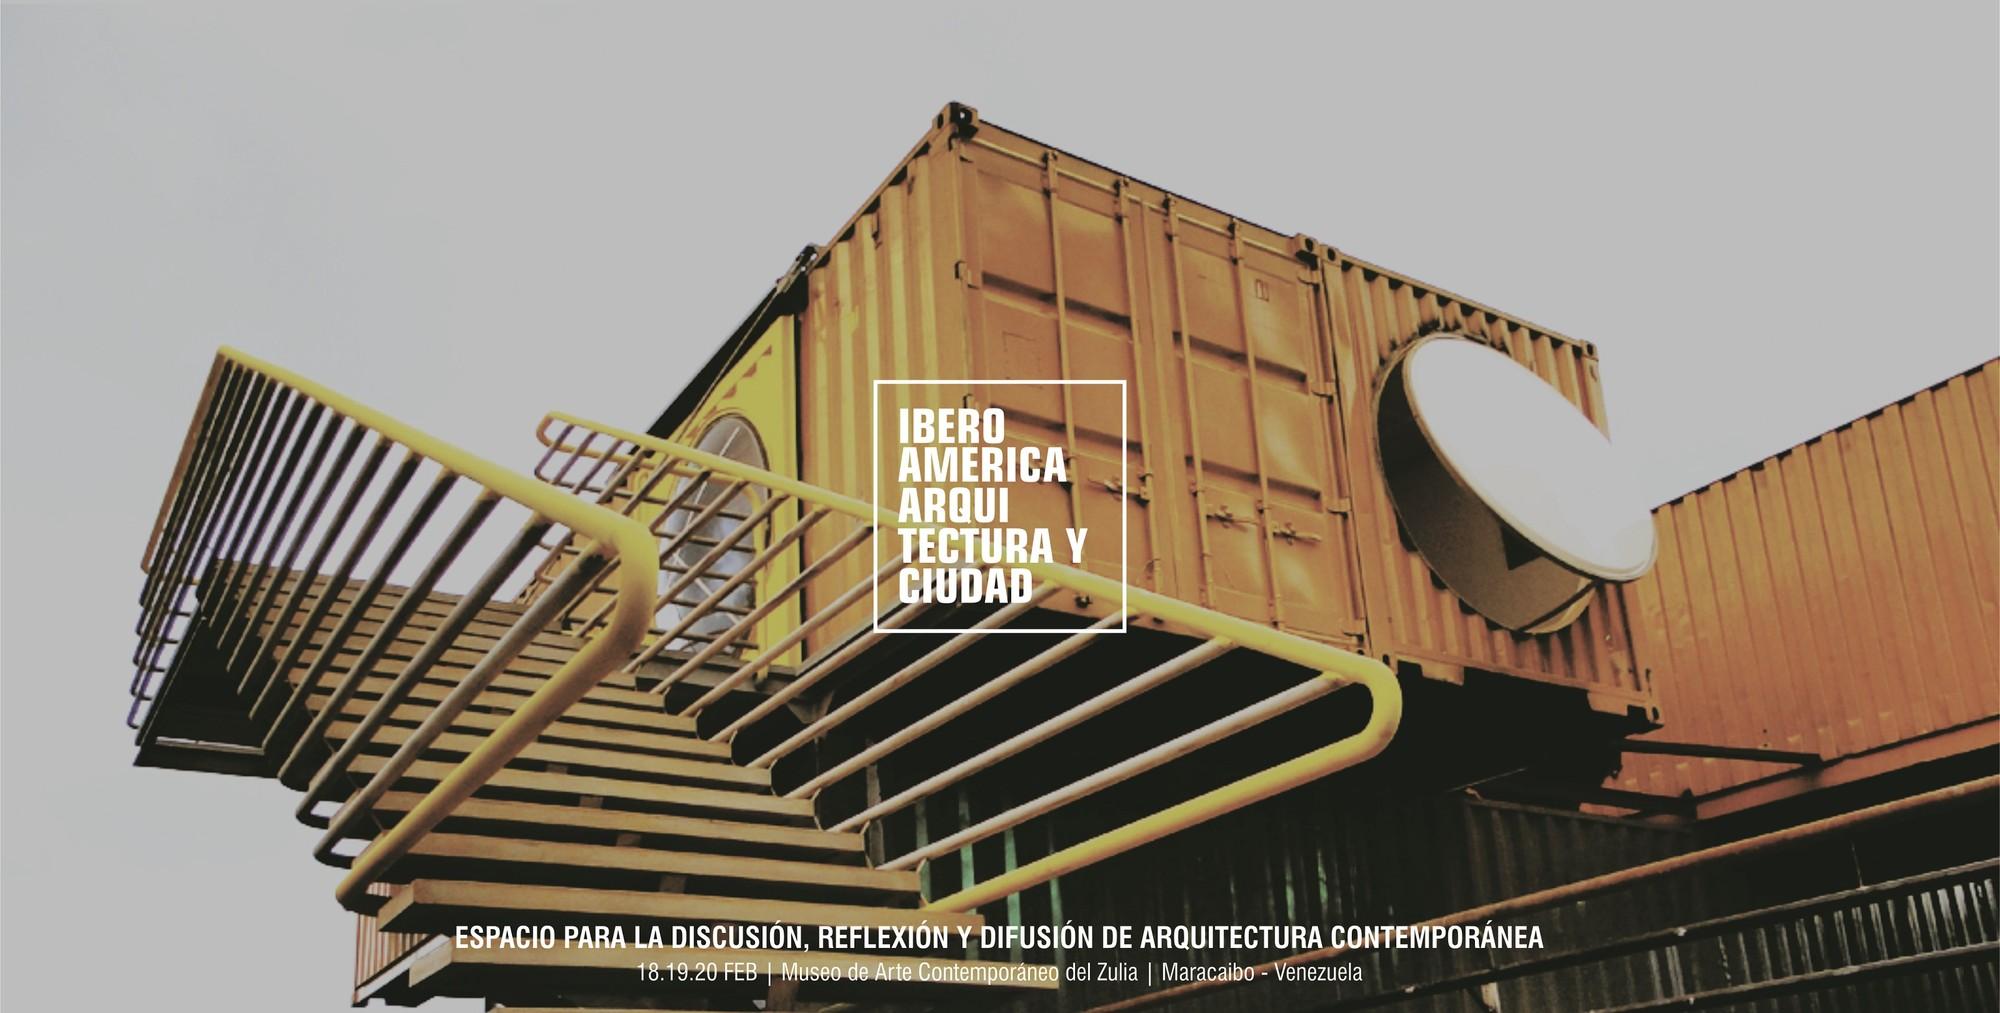 IAC2015: Festival de Arquitectura Contemporánea en Venezuela / ¡Sorteamos dos cupos!